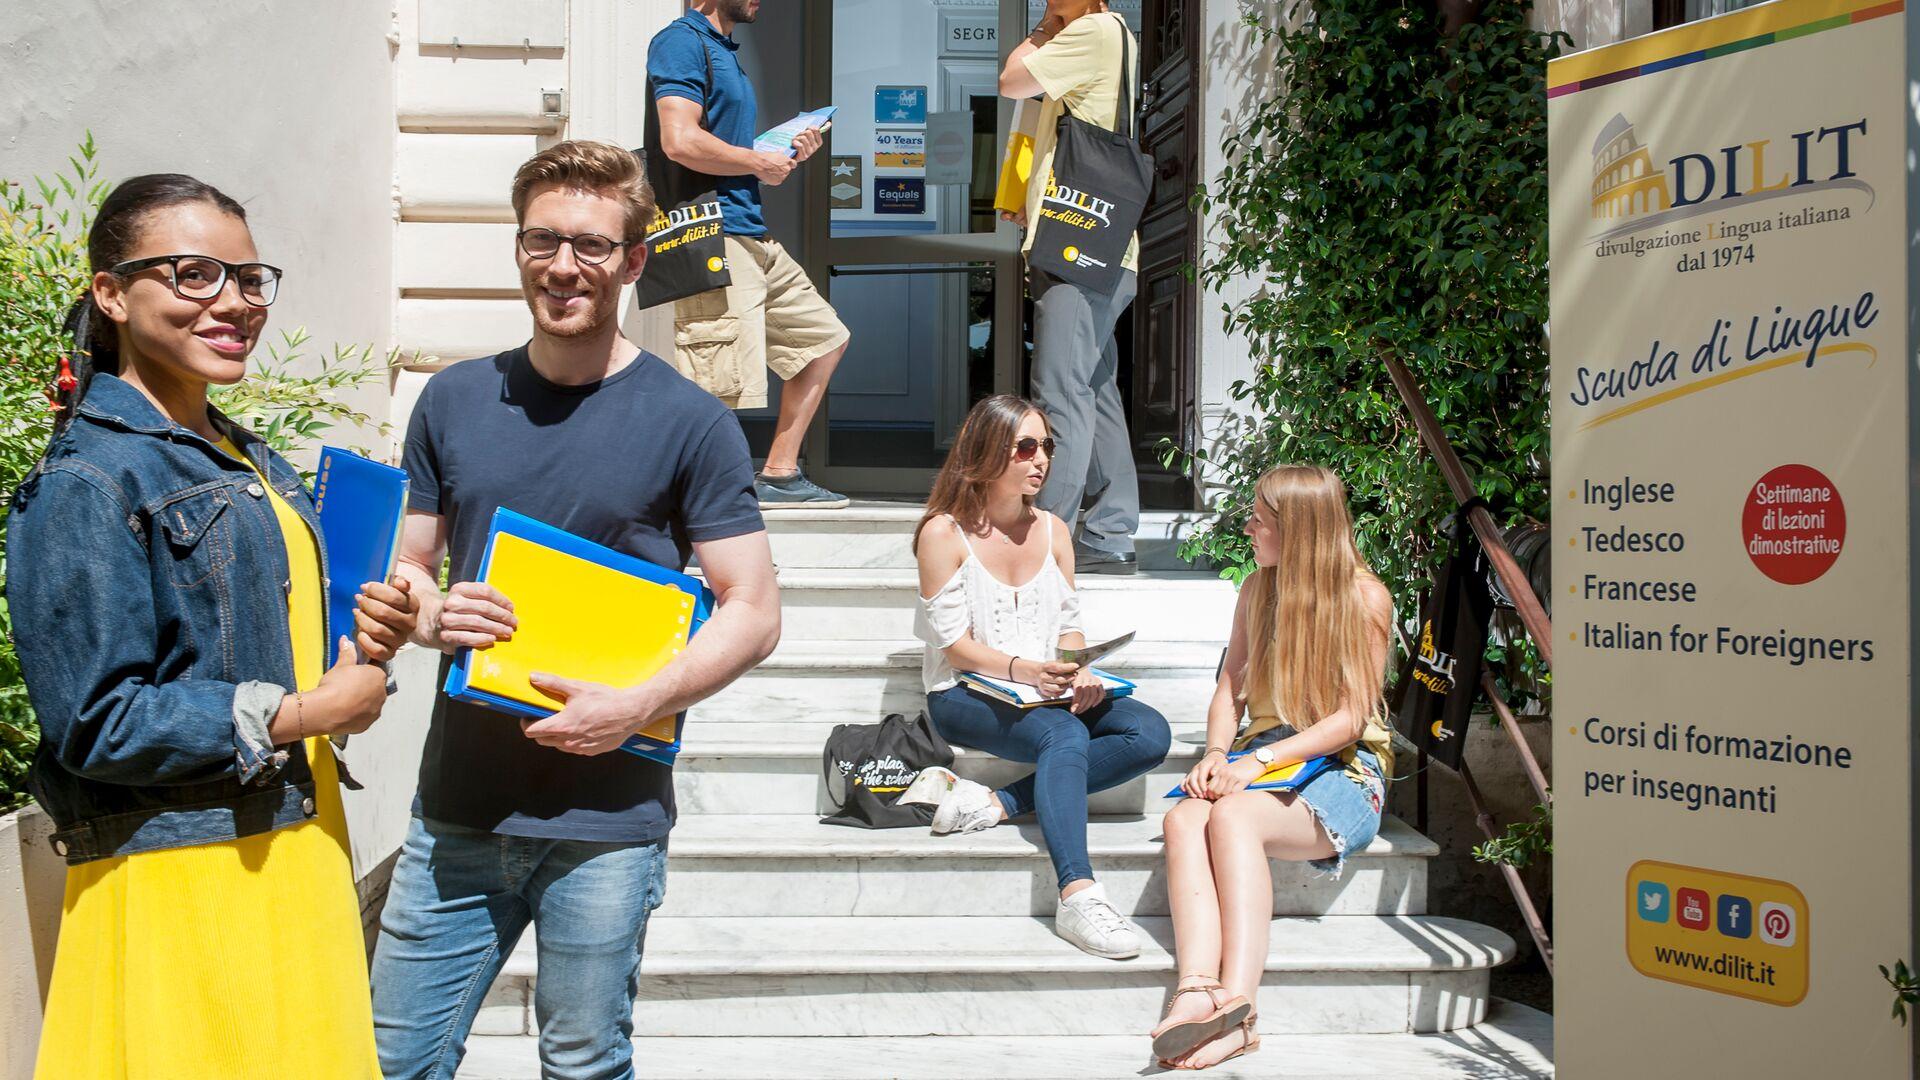 Sprachaufenthalt Italien, Rom - Dilit International House Roma - Schule